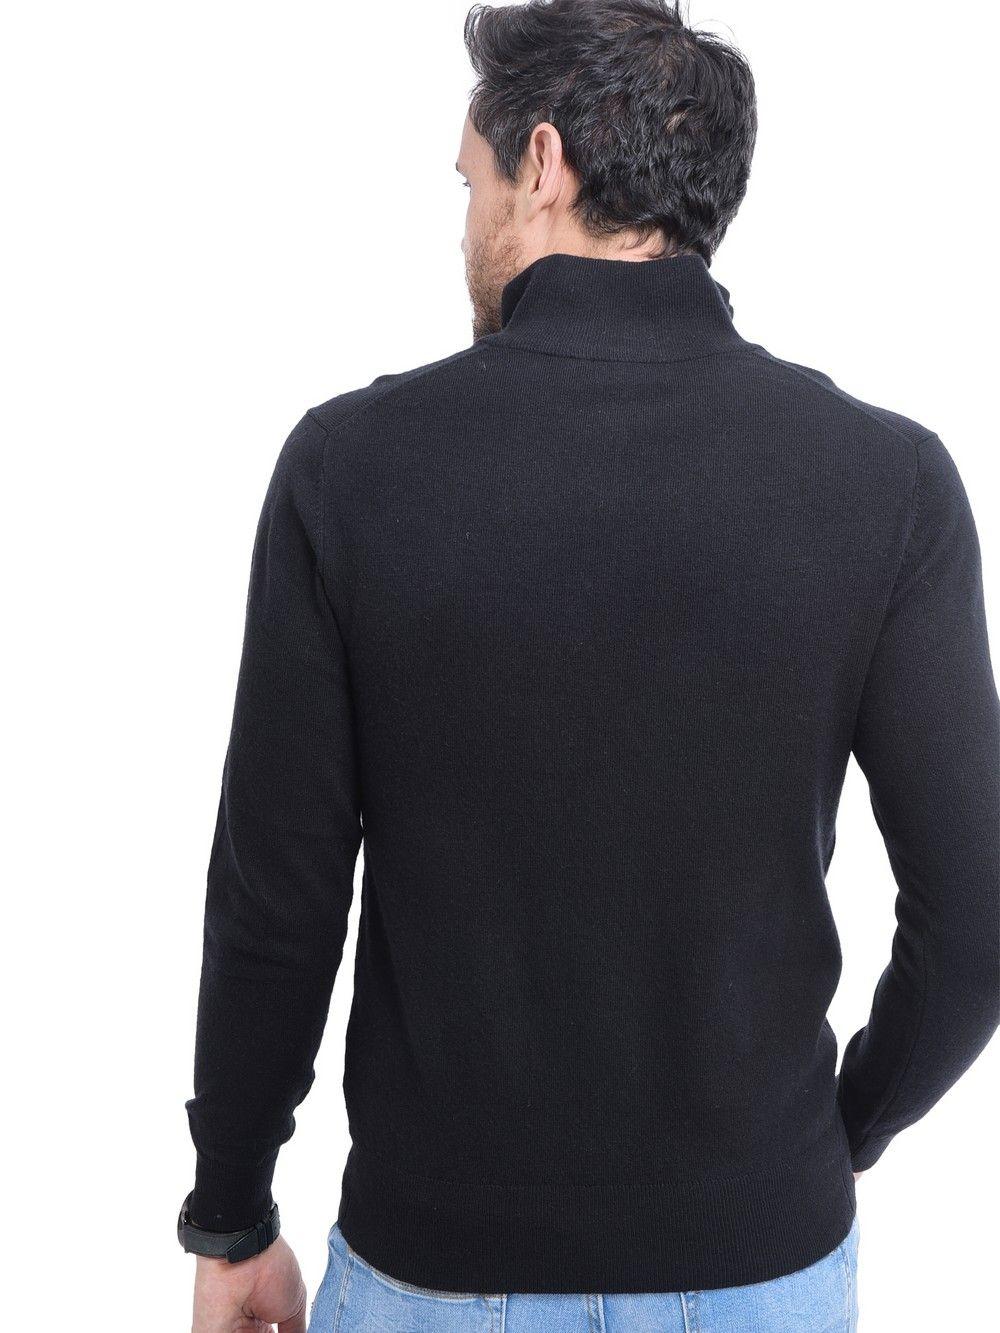 C&JO High Neck Half Zip Sweater with Leather Zip in Black